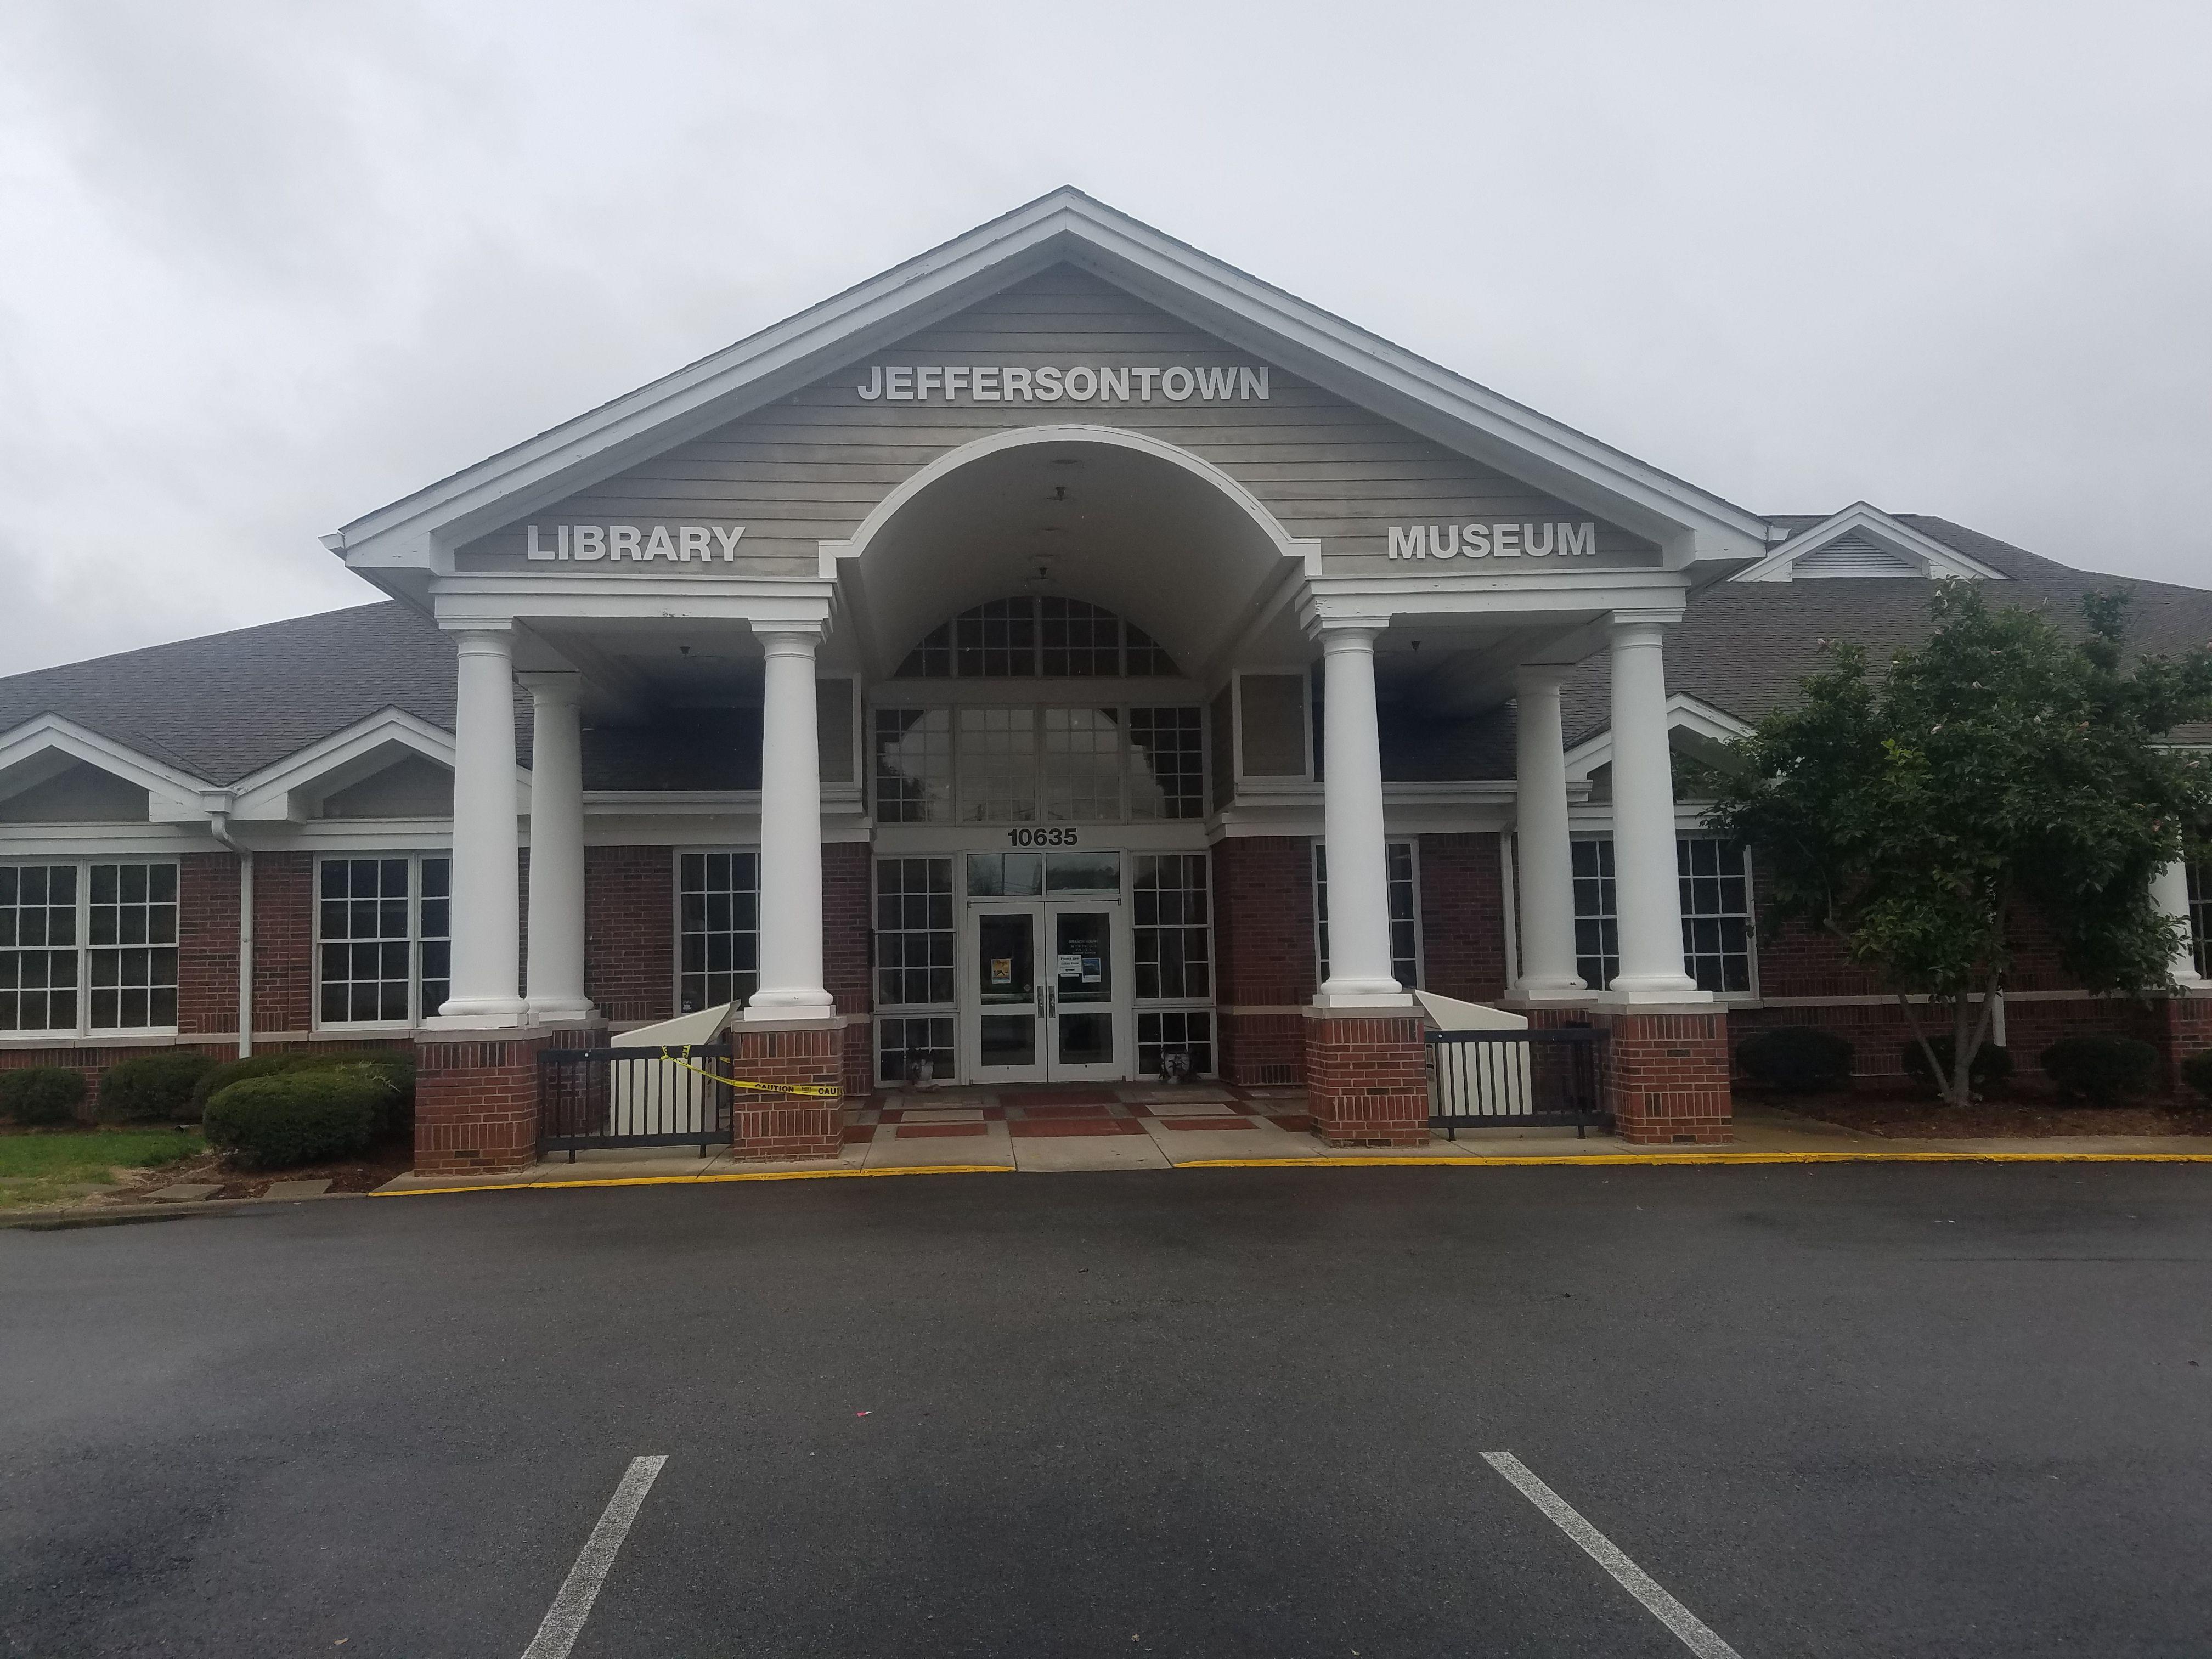 Jeffersontown Historical Museum